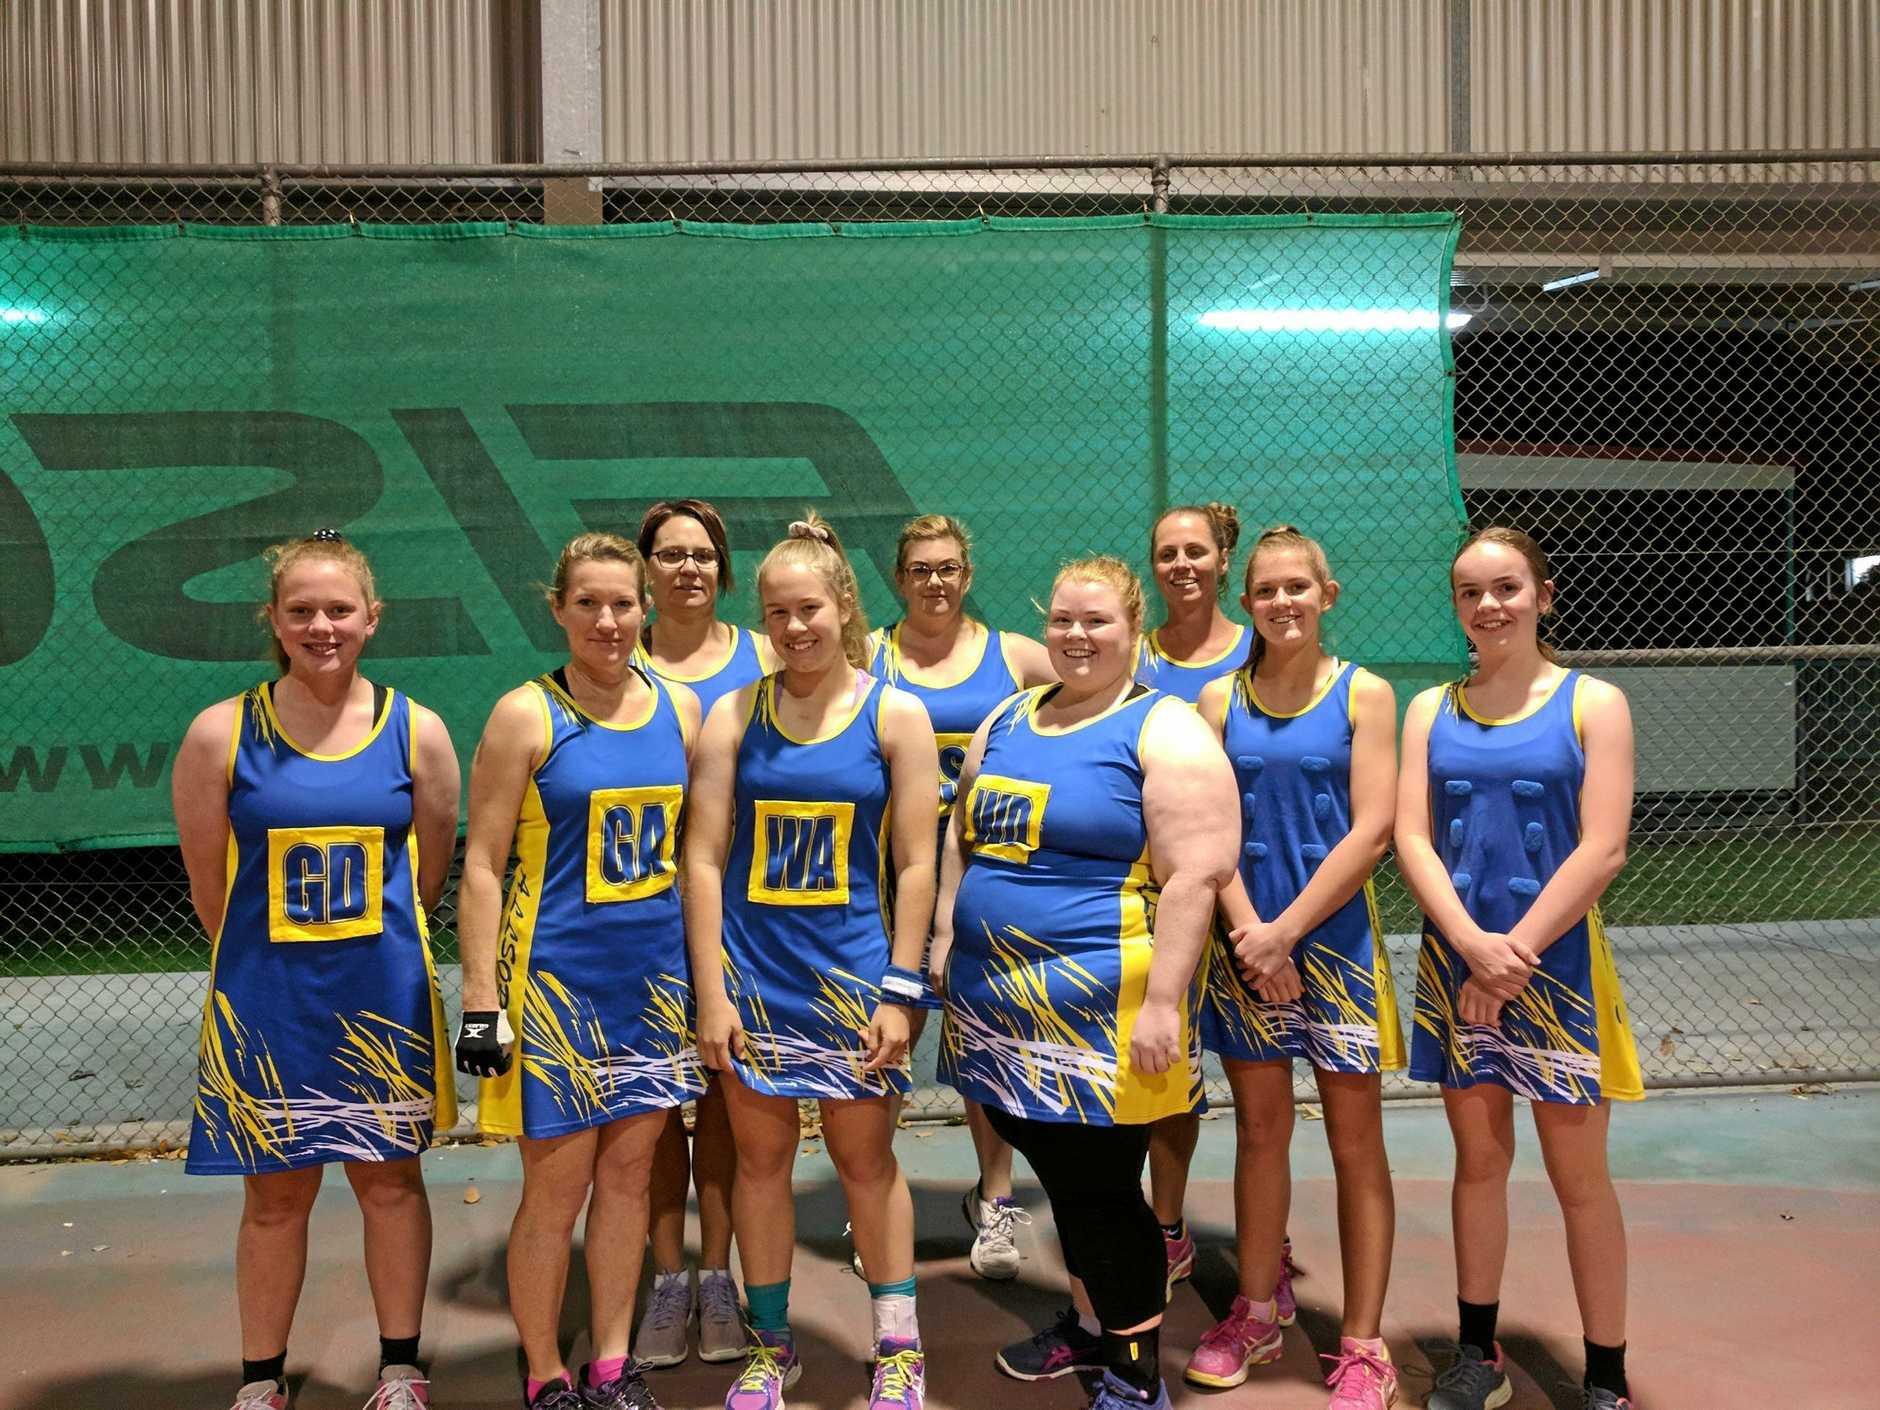 Gayndah Netball Senior competition team Allsorts, which fell just short of a grand final berth.